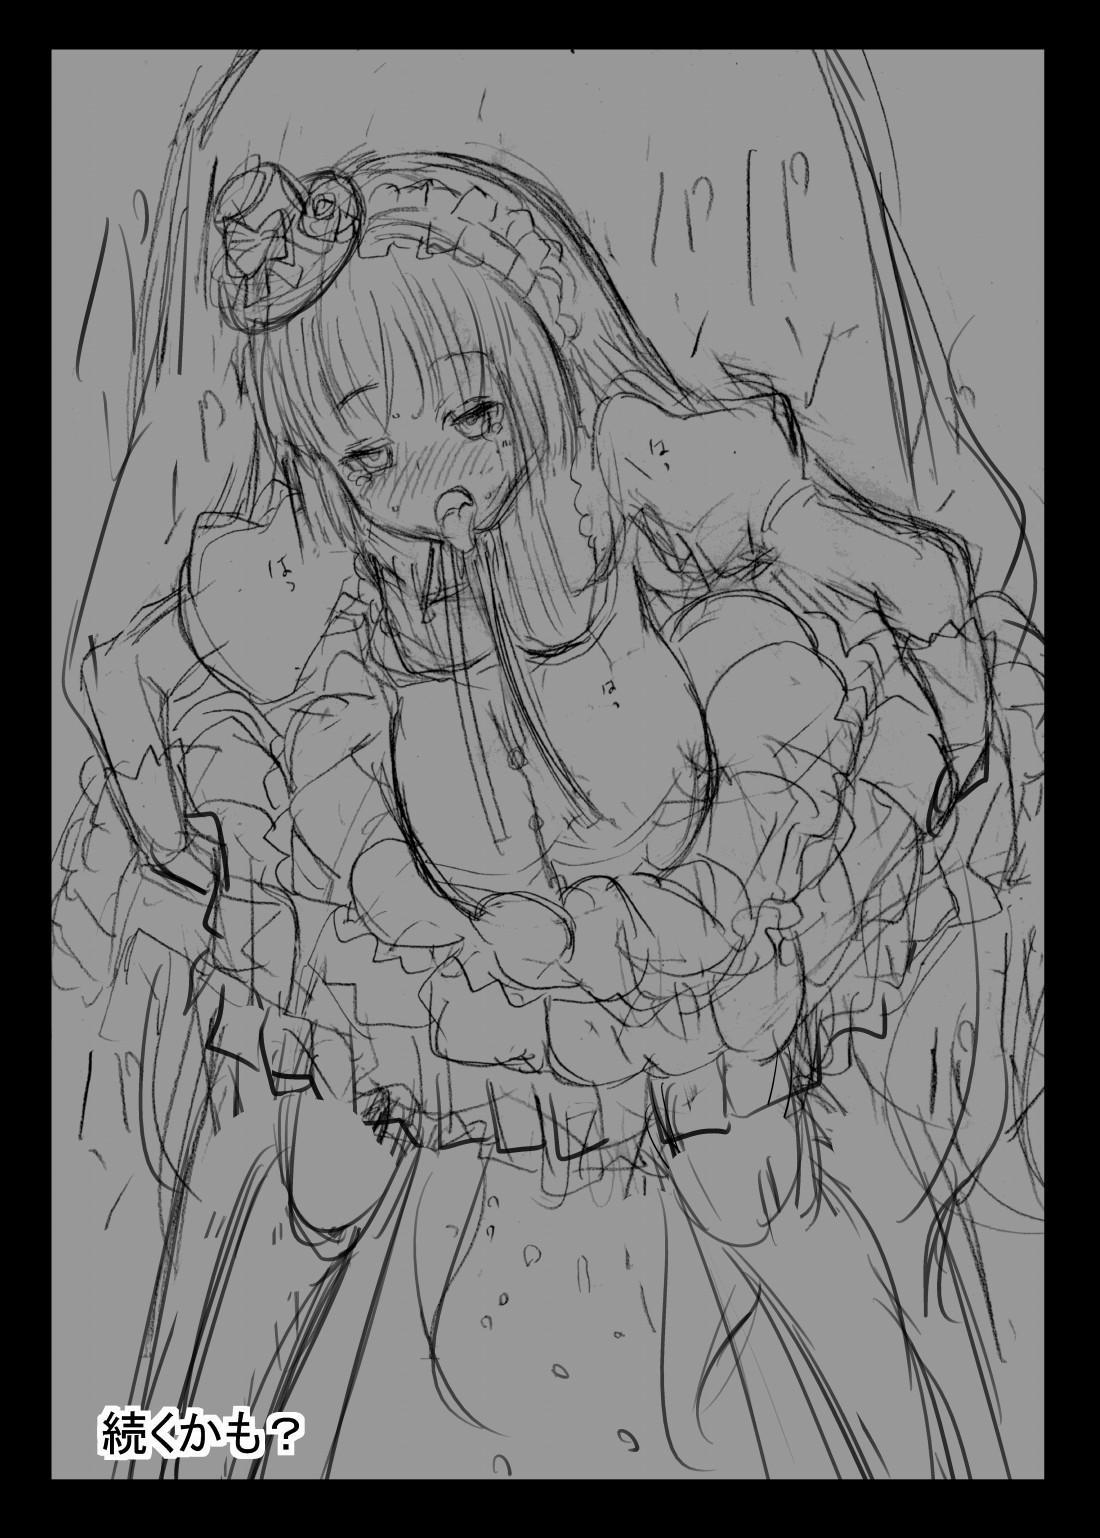 [HellDevice (nalvas)] Kuro Gosick-chan - Black Gosick Girl (GOSICK) [Digital] 19